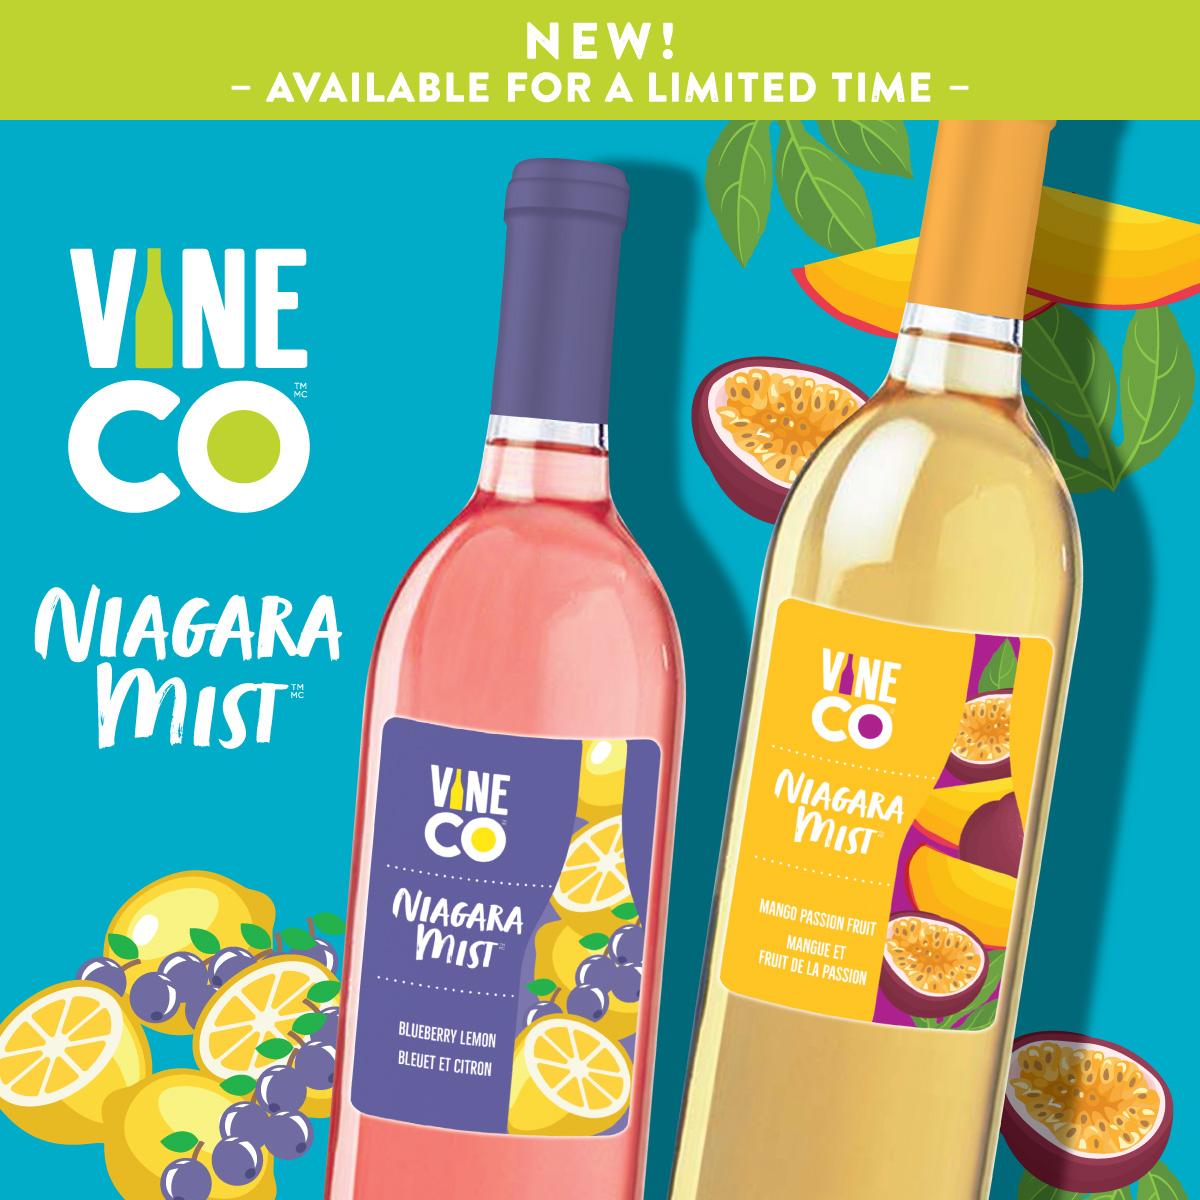 Niagara Mist Limited Release